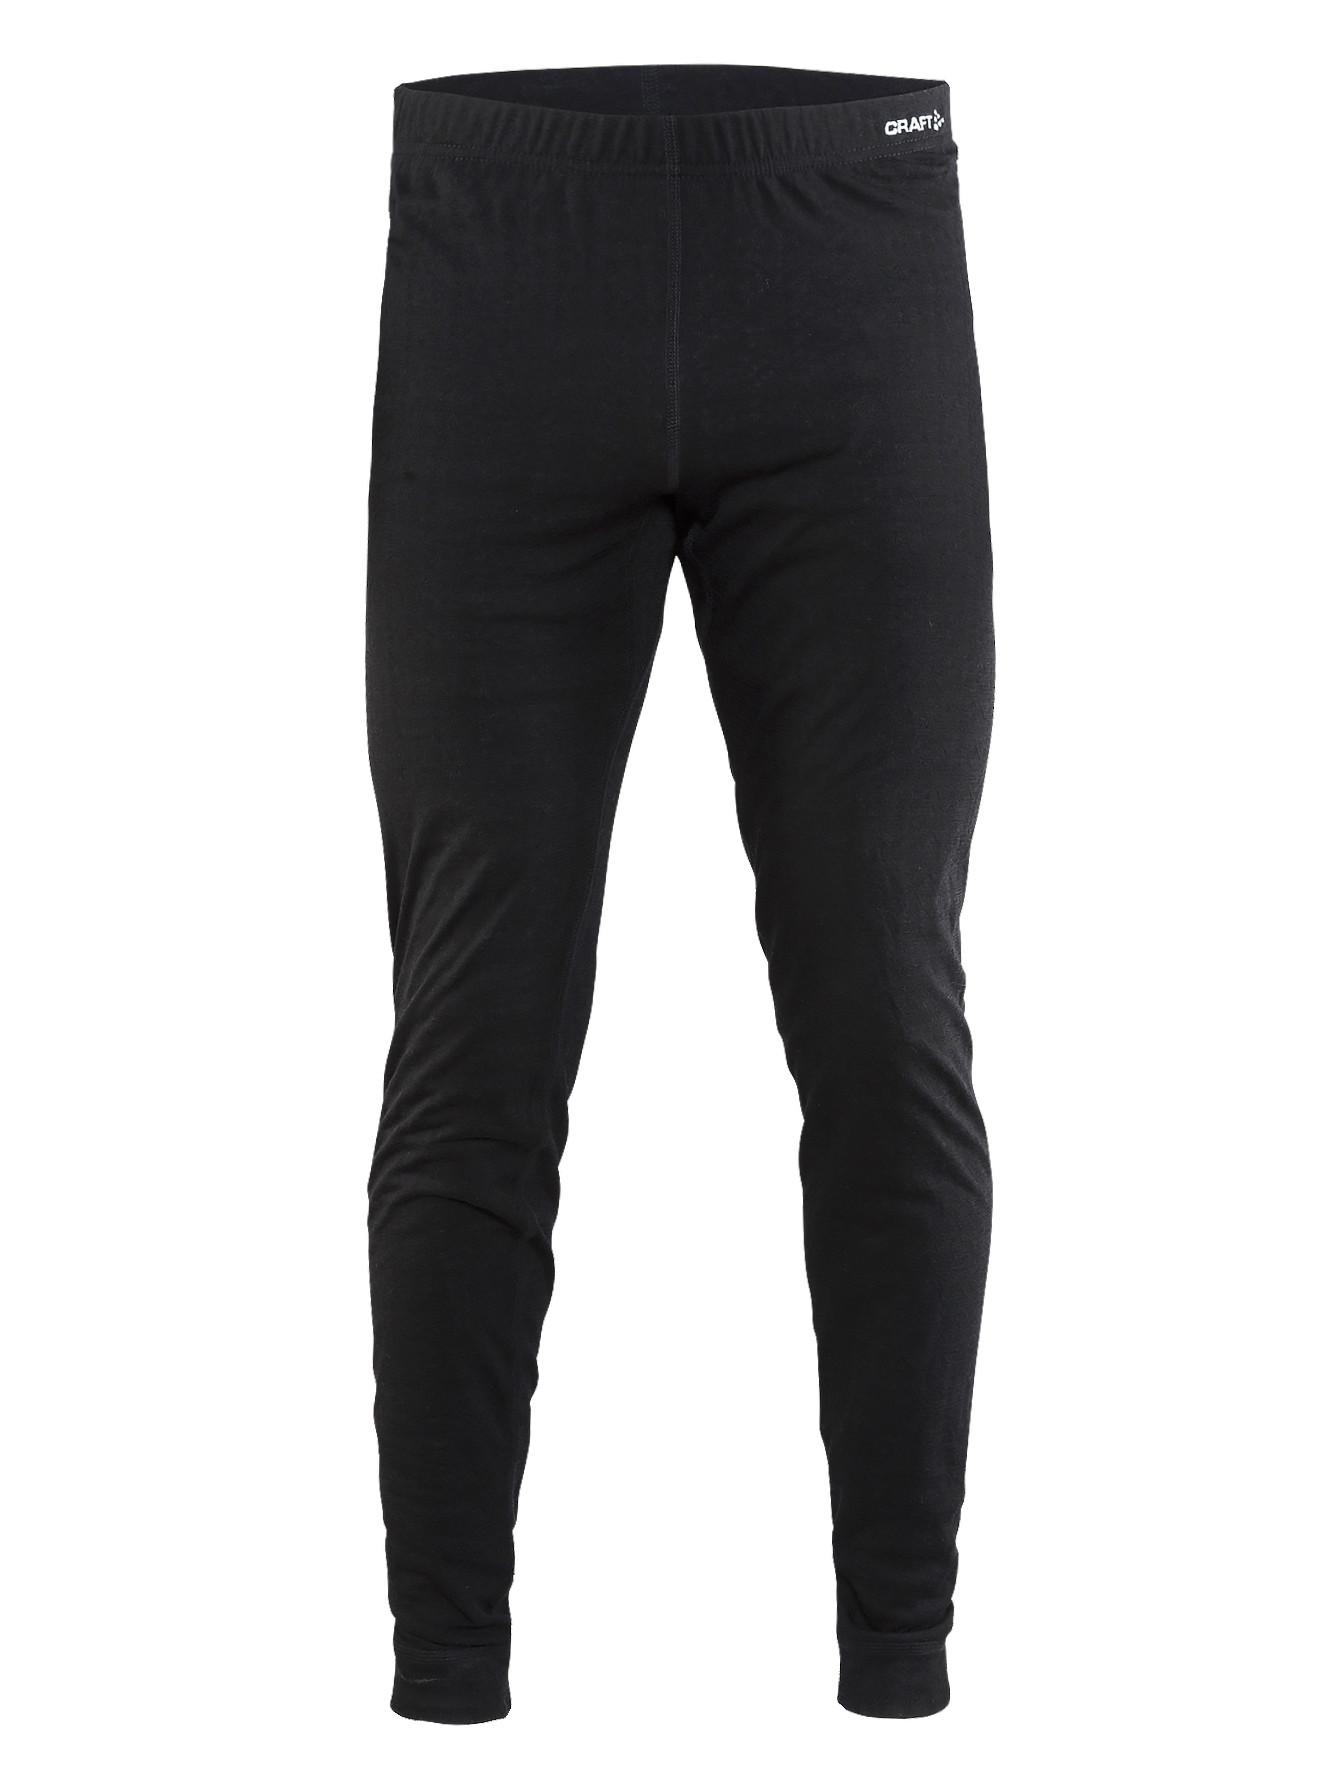 Термоштаны Craft Nordic Wool Pants M Black/Dark Grey Melange L